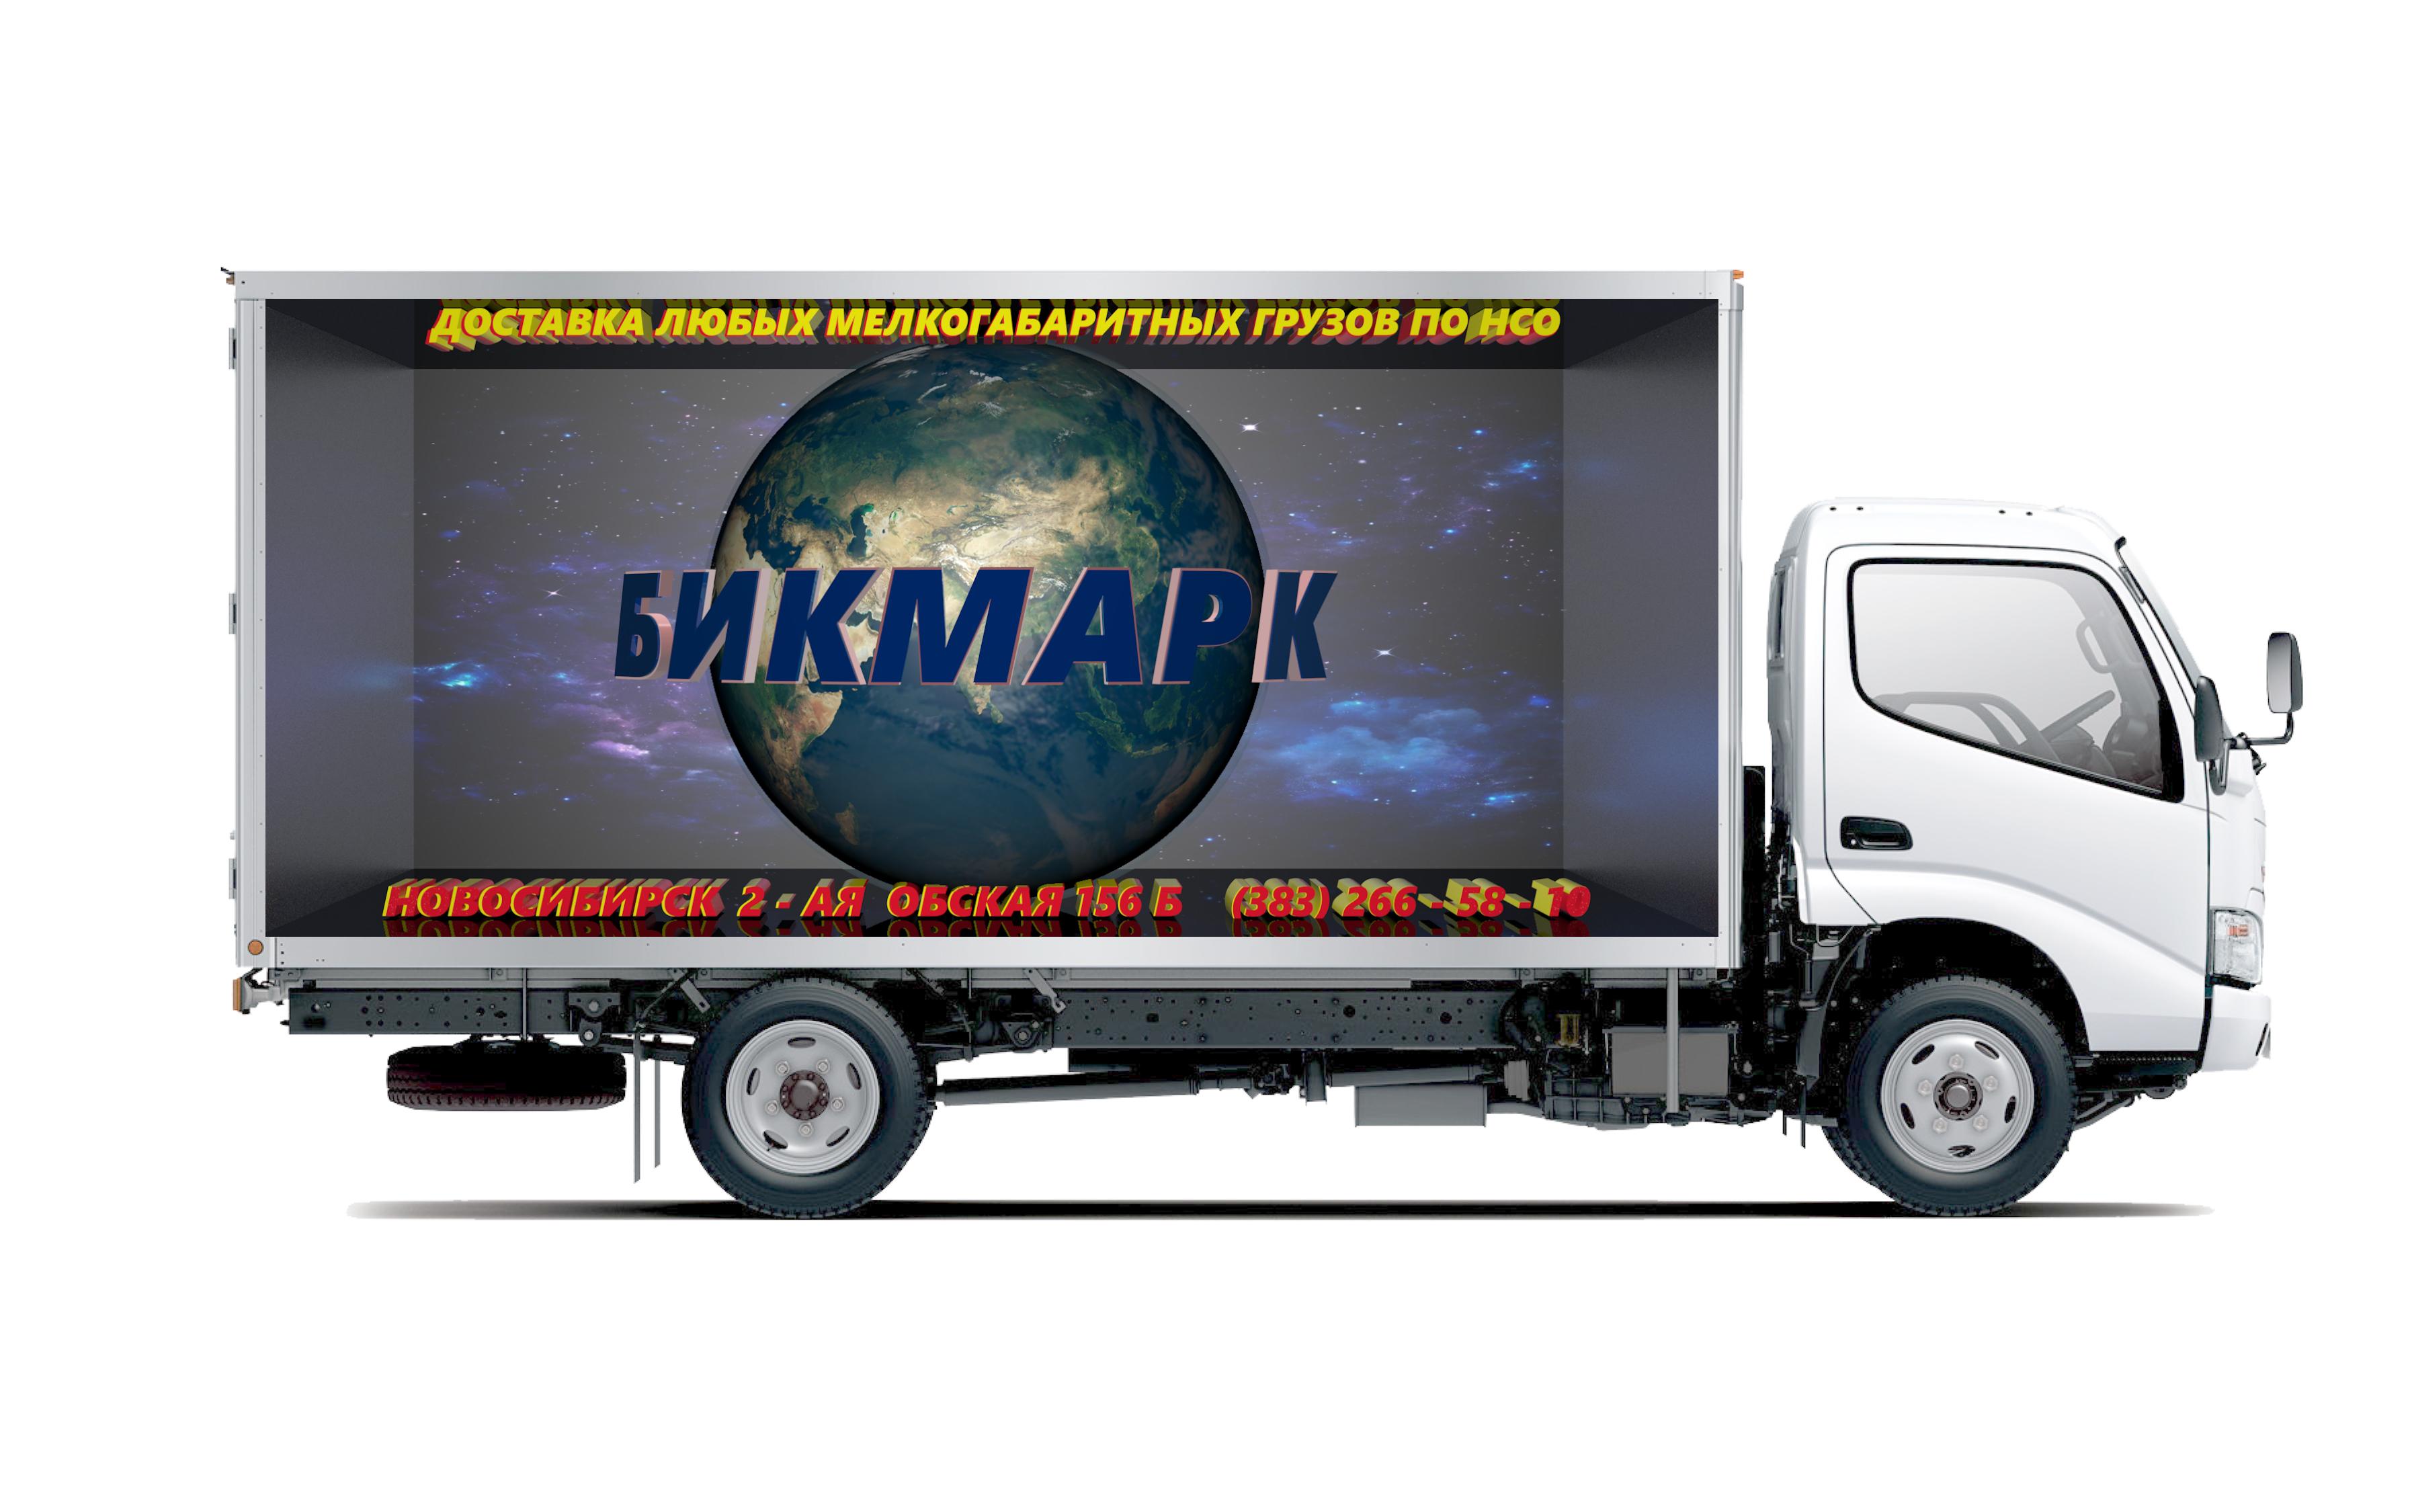 Разработка  рекламы на грузовые машины фото f_7715b2fba9eb220b.jpg